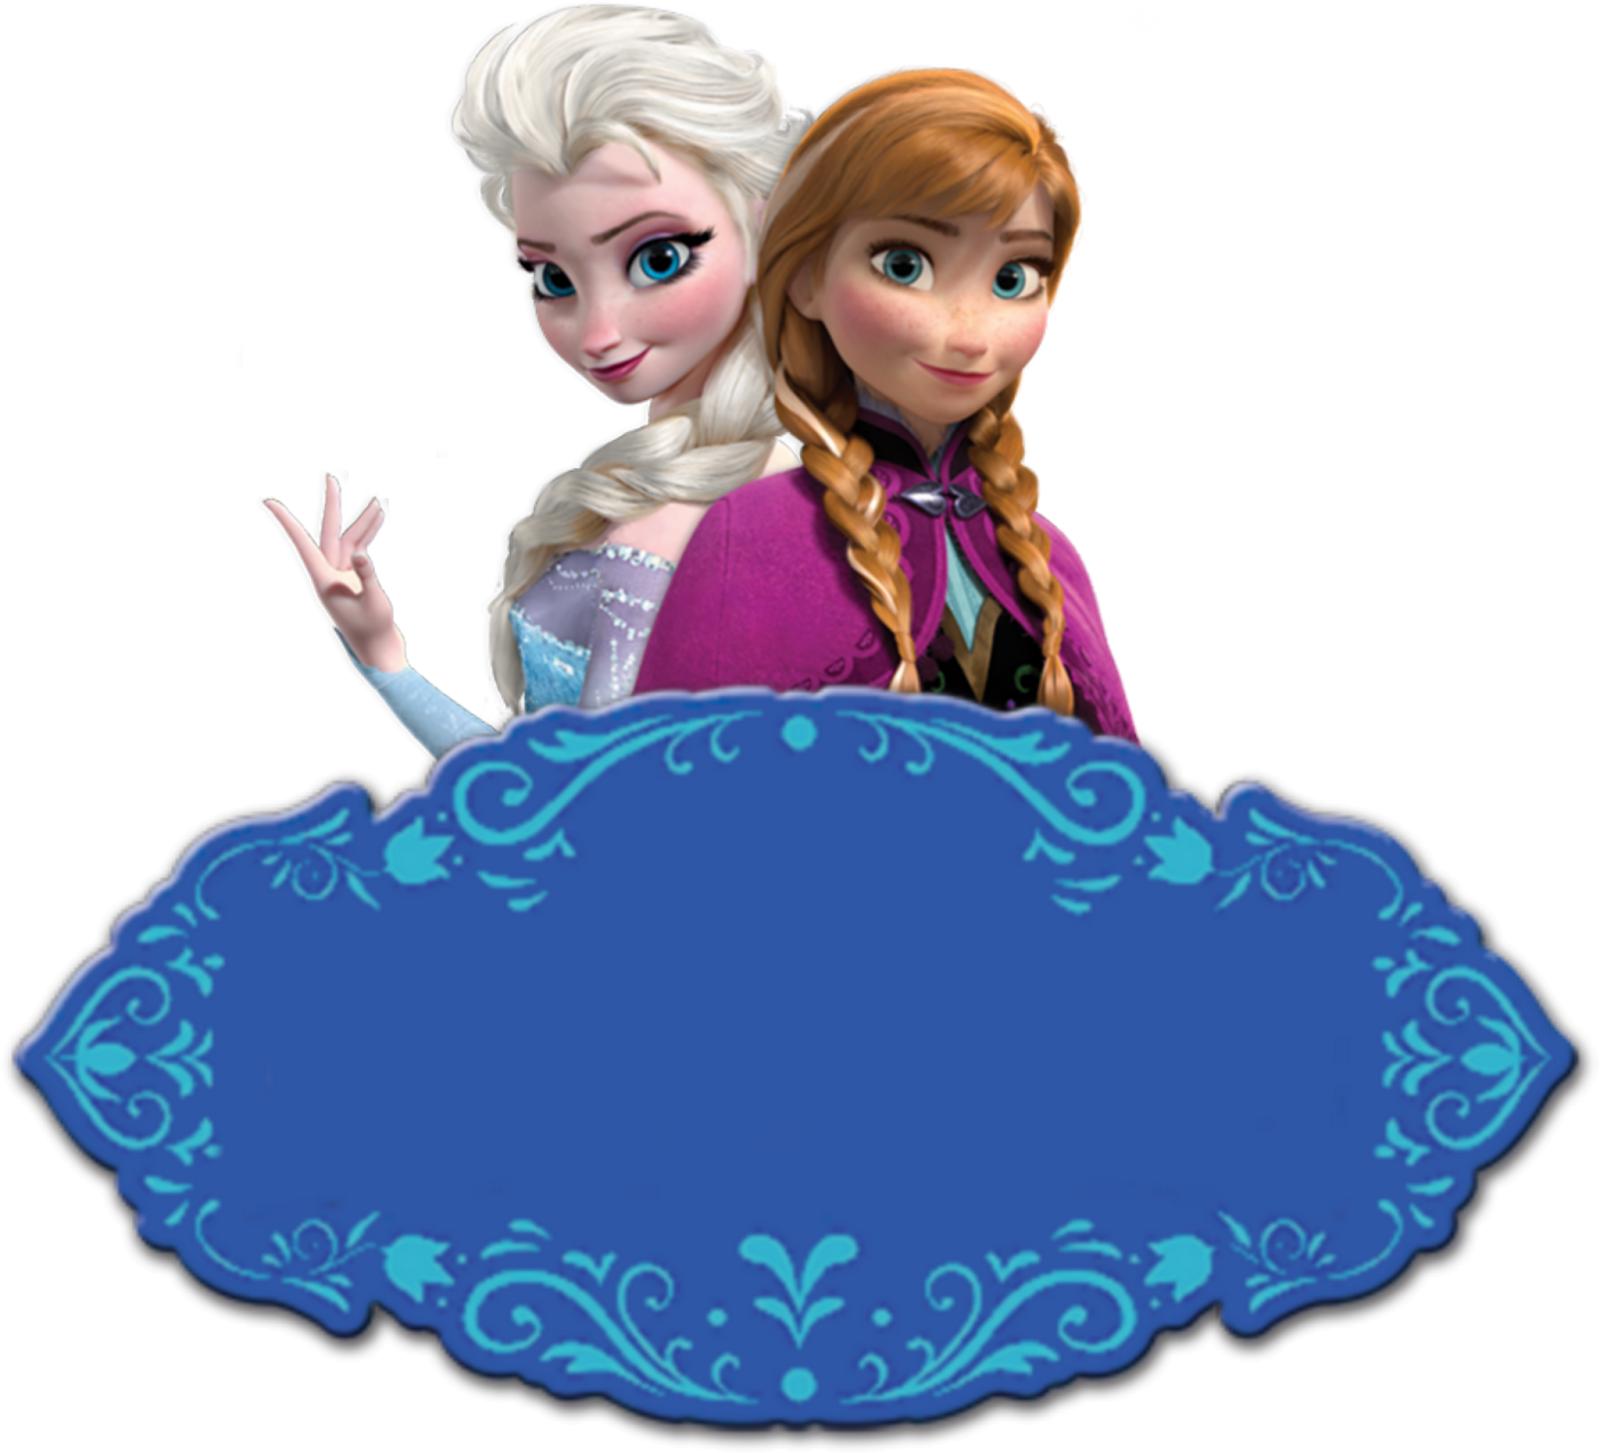 Fazendo a Propria Festa: KIT DE PERSONALIZADOS TEMA FROZEN Mais - PNG Frozen